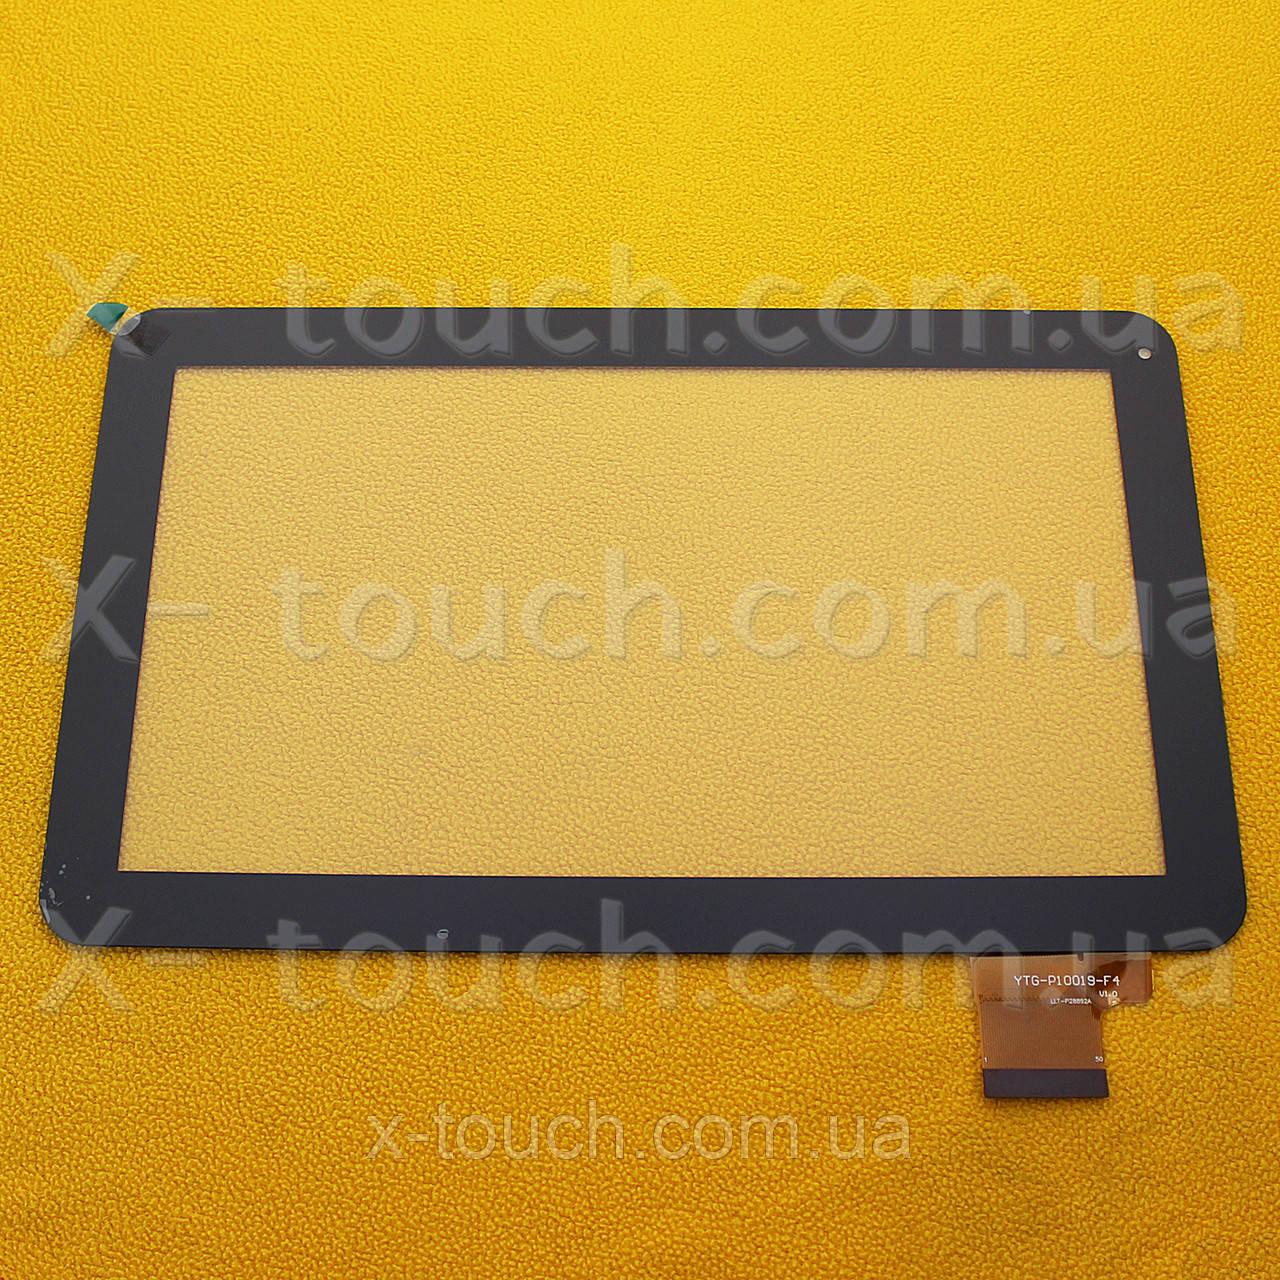 Тачскрин, сенсор  YTG-P10019-F4 для планшета